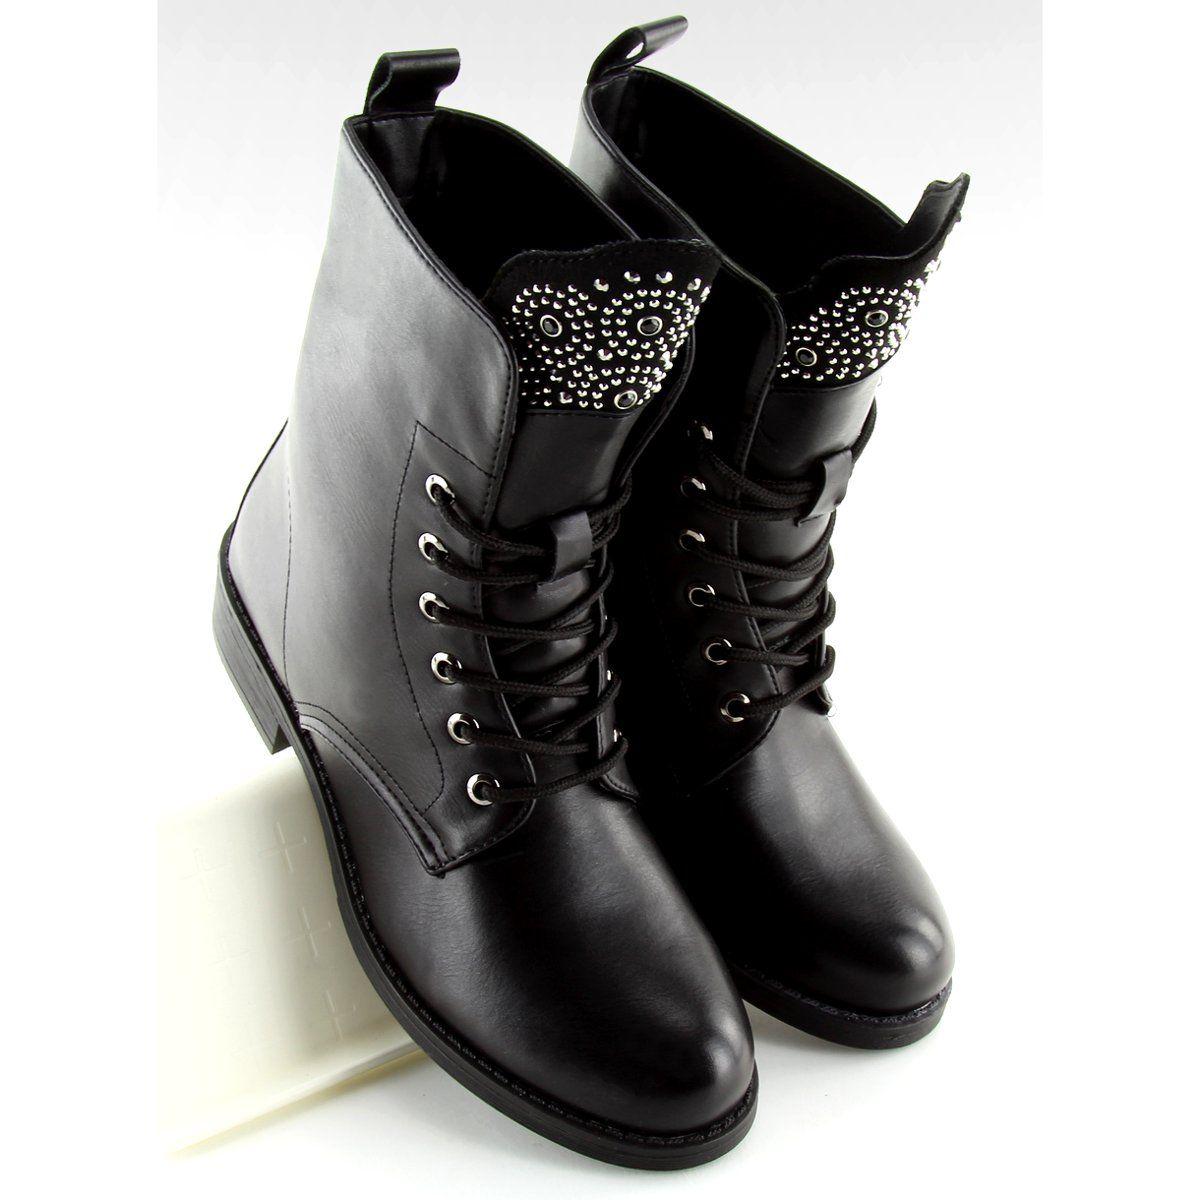 Botki Workery Czarne Jw11 Black Biker Boot Boots Shoes